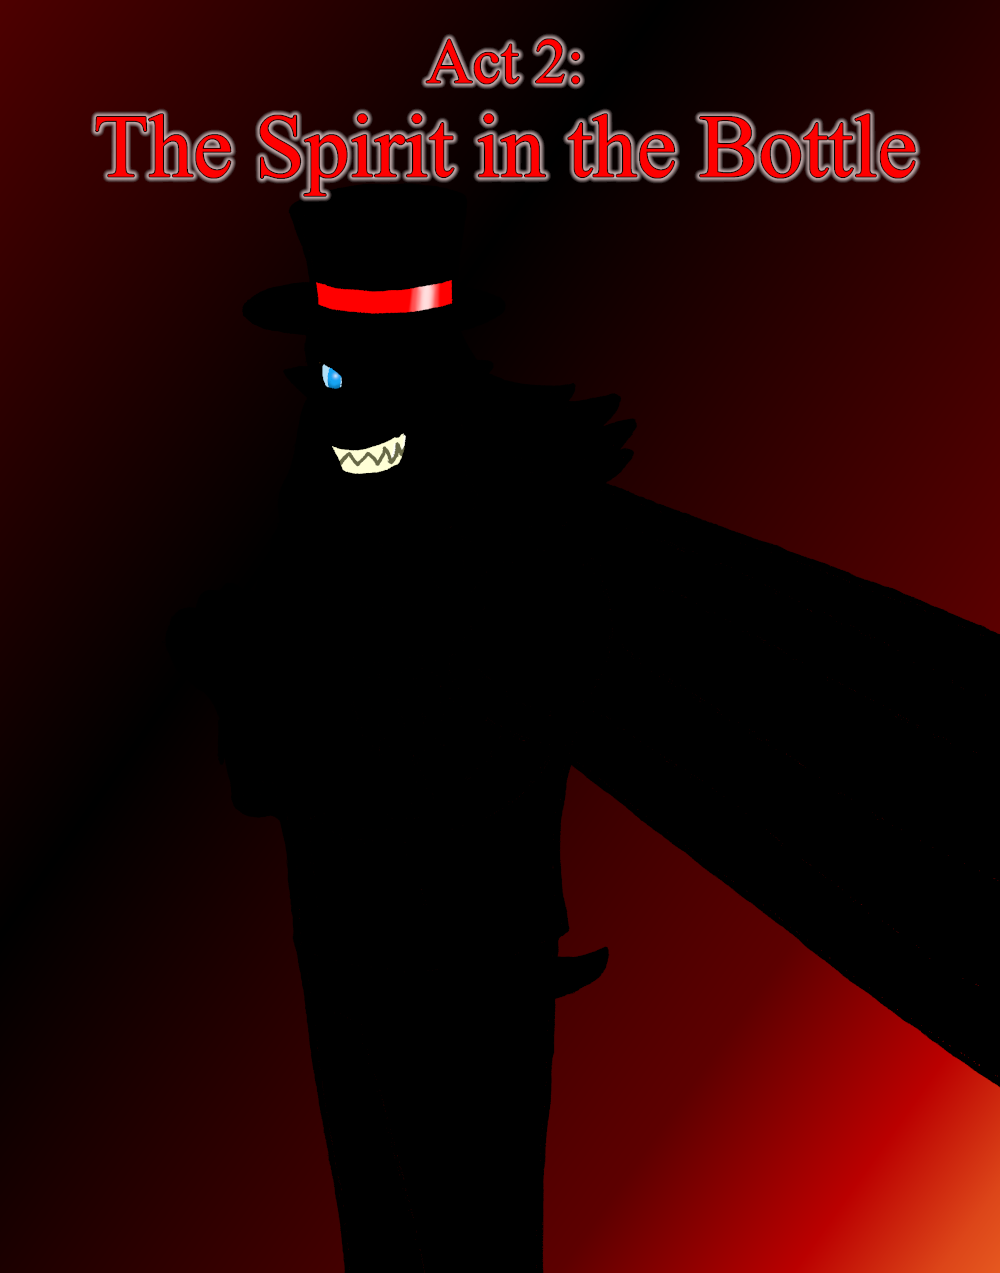 The Spirit in the Bottle